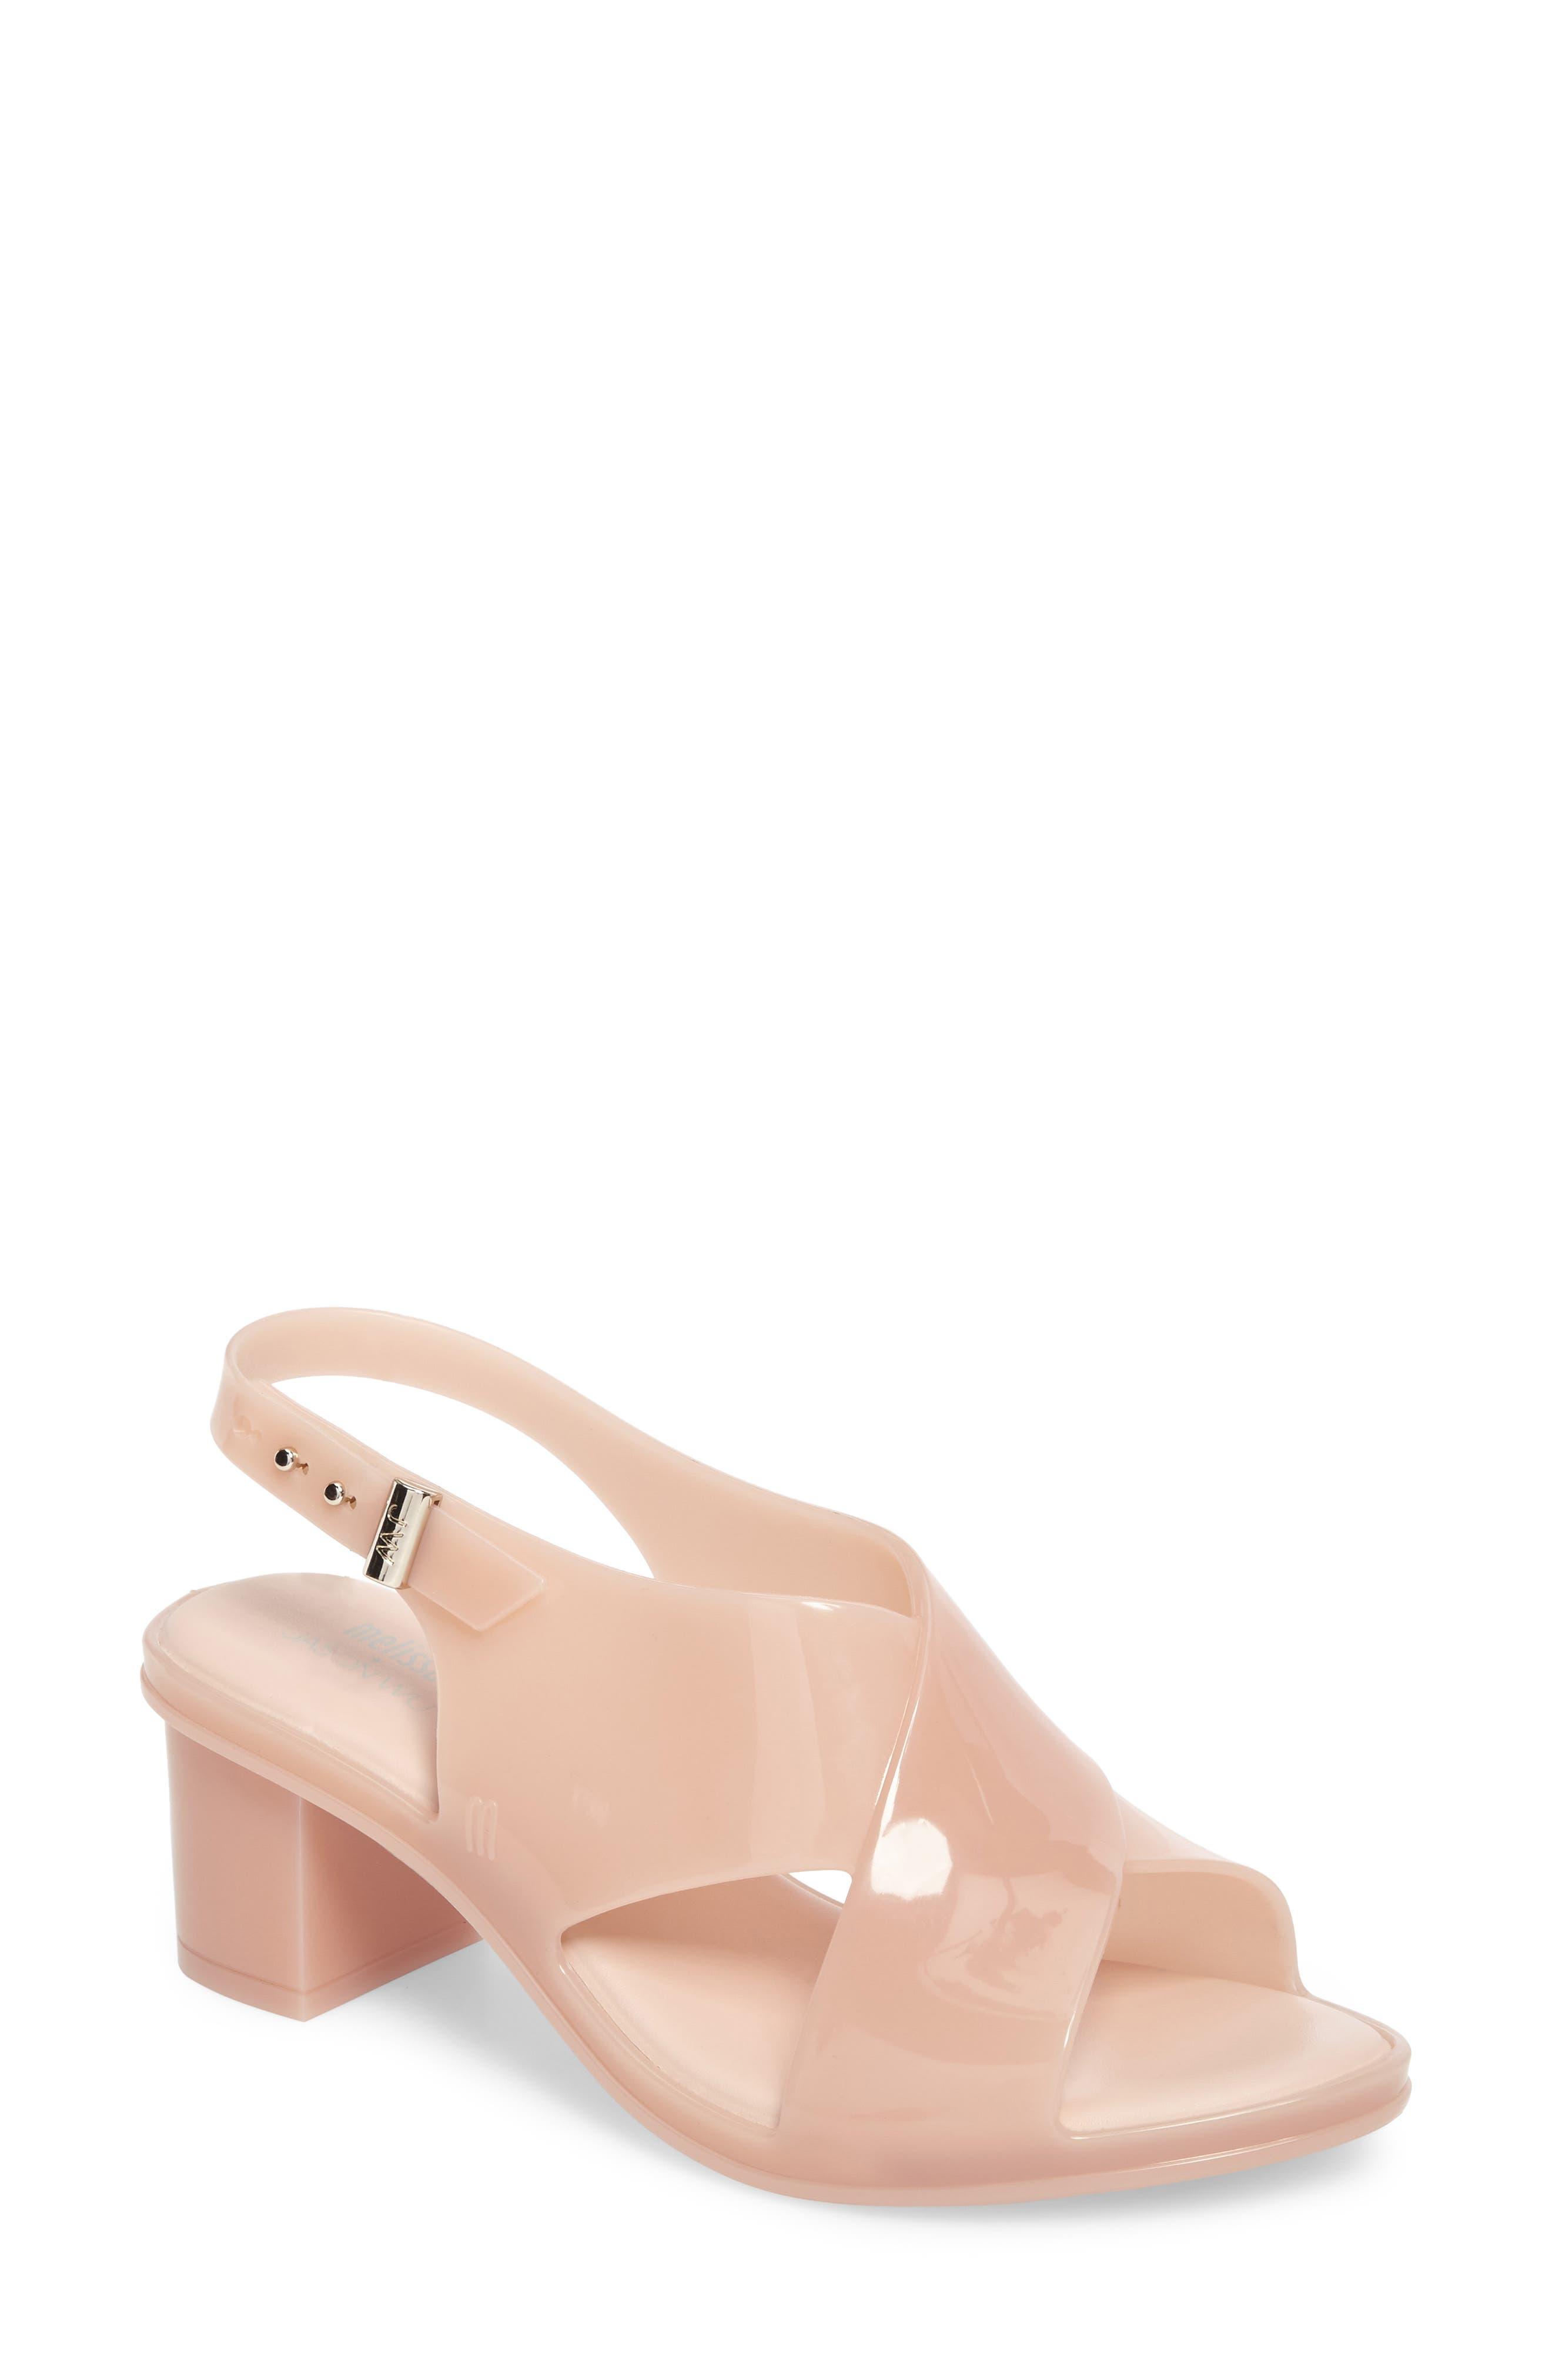 x Jason Wu Jamie Cross Strap Slingback Sandal,                         Main,                         color, Light Pink Matte